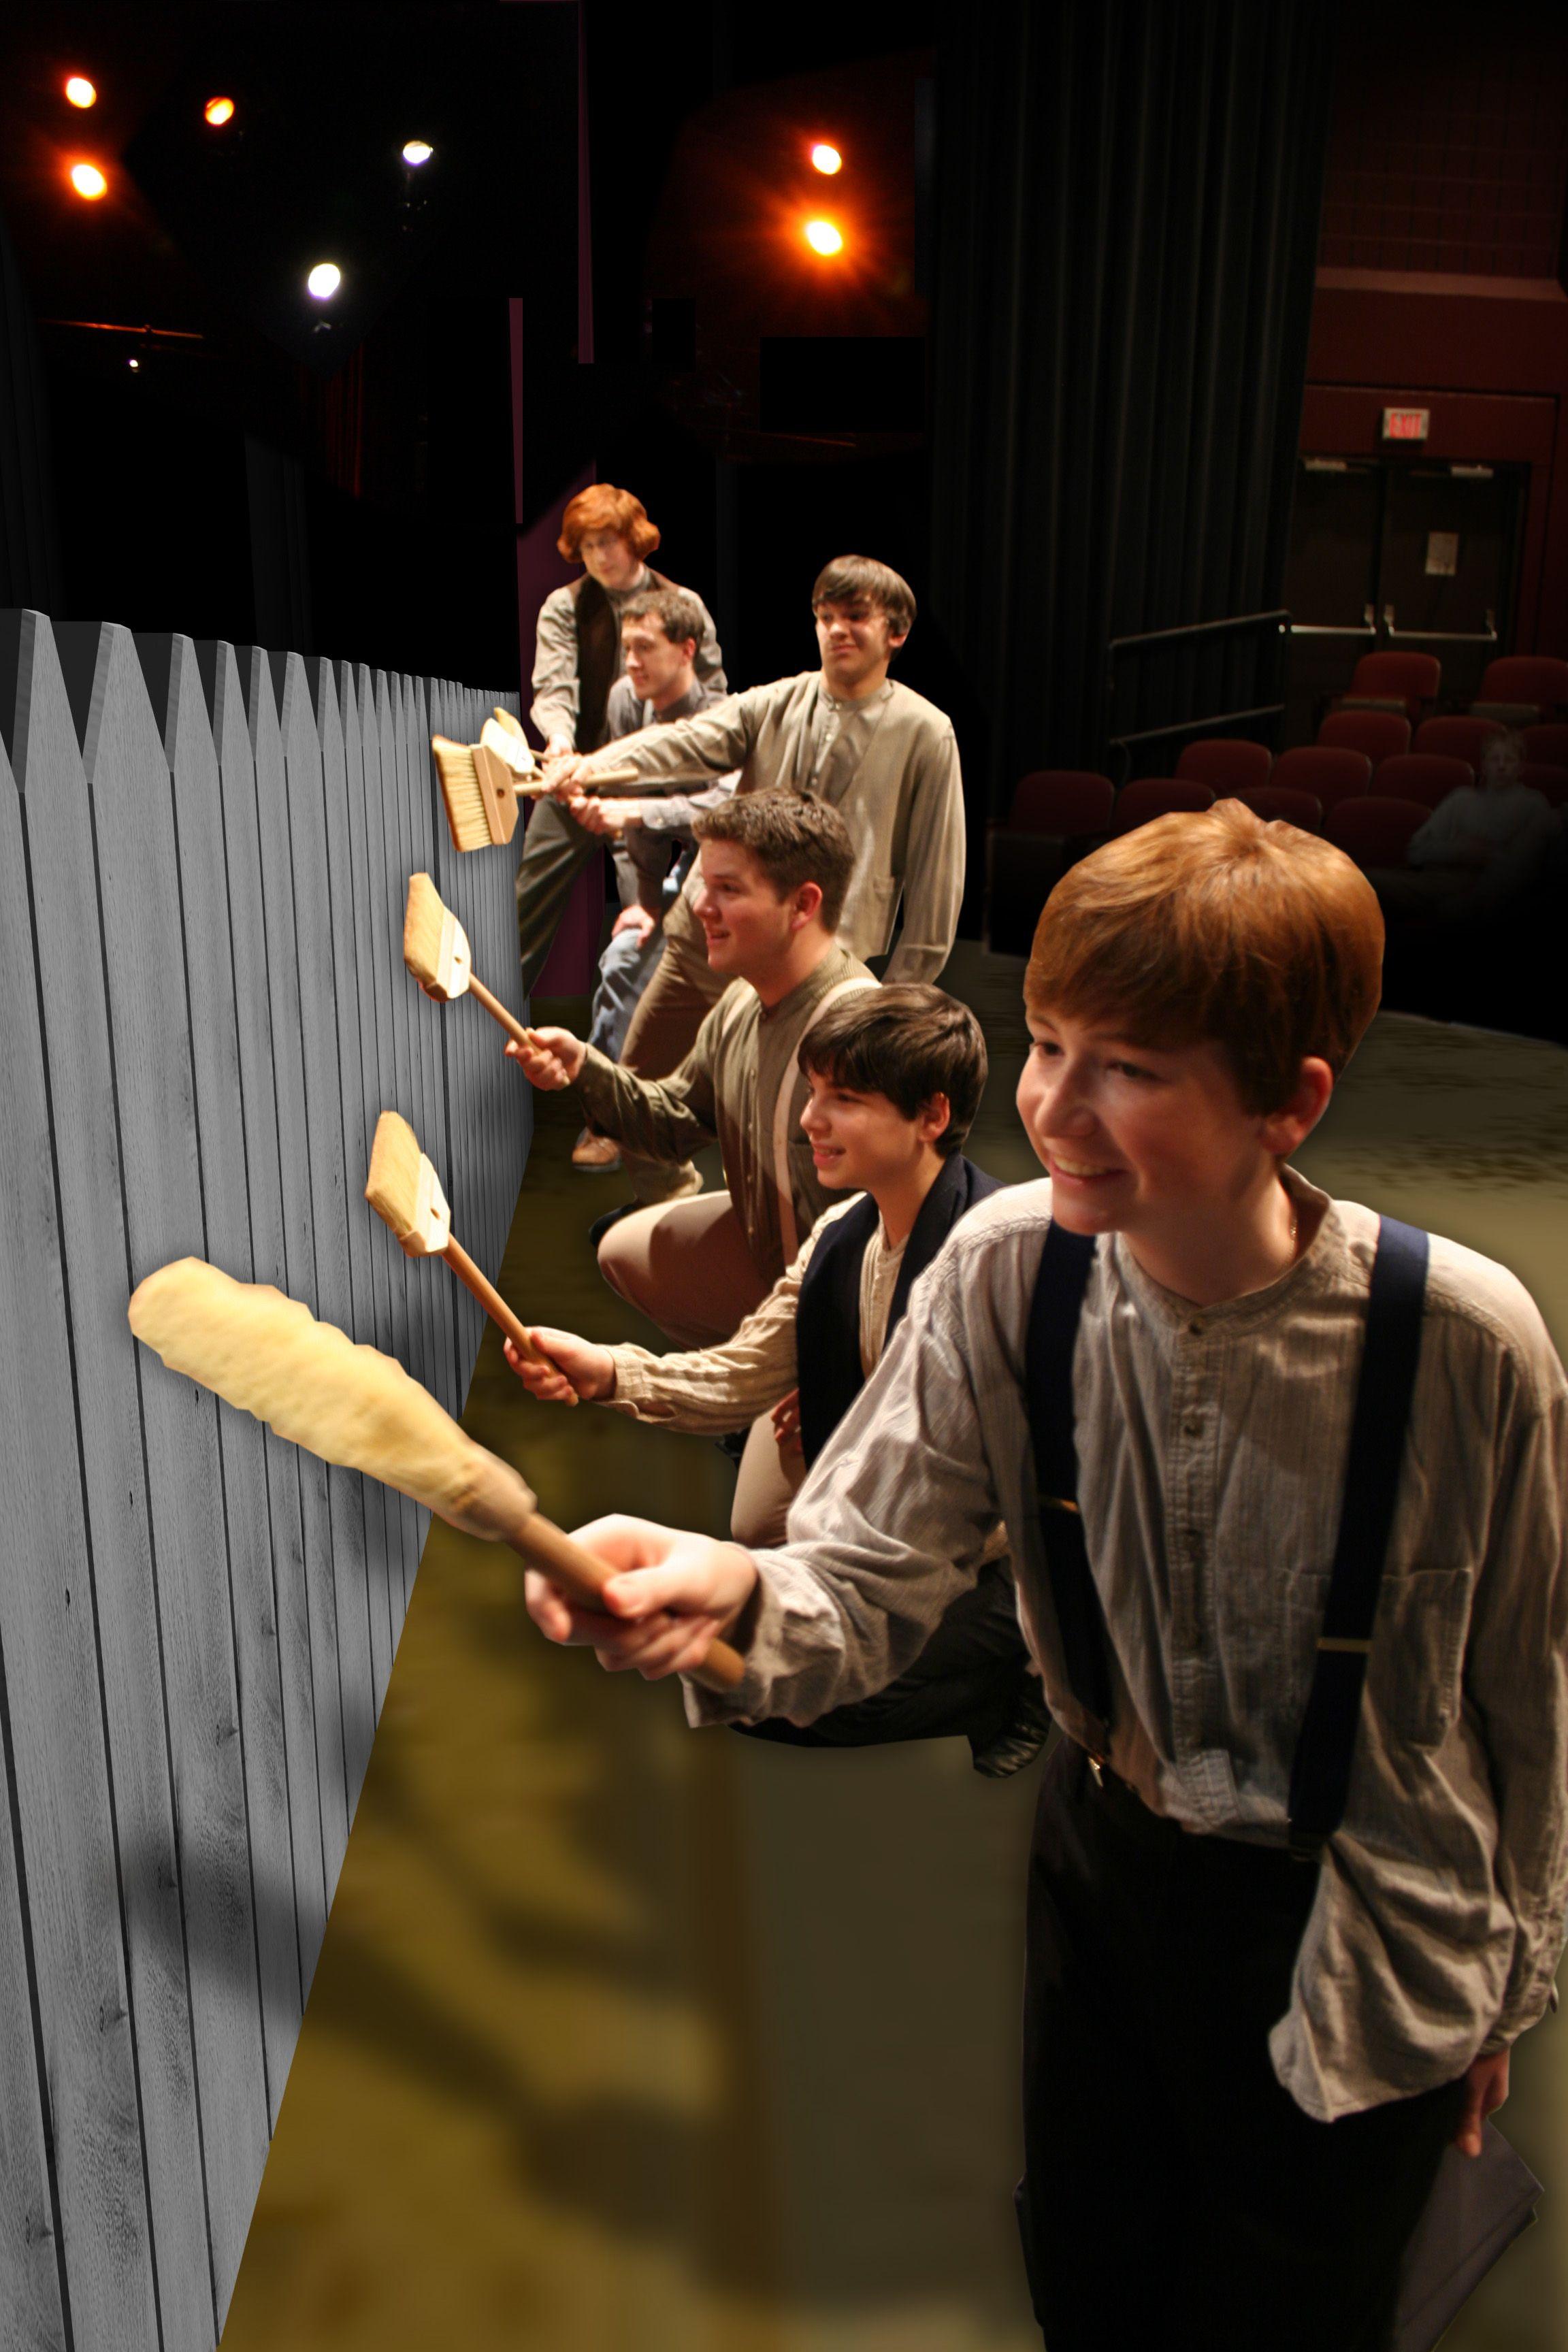 Tom Sawyer Broadway | The Adventures of Tom Sawyer the Broadway Musical.